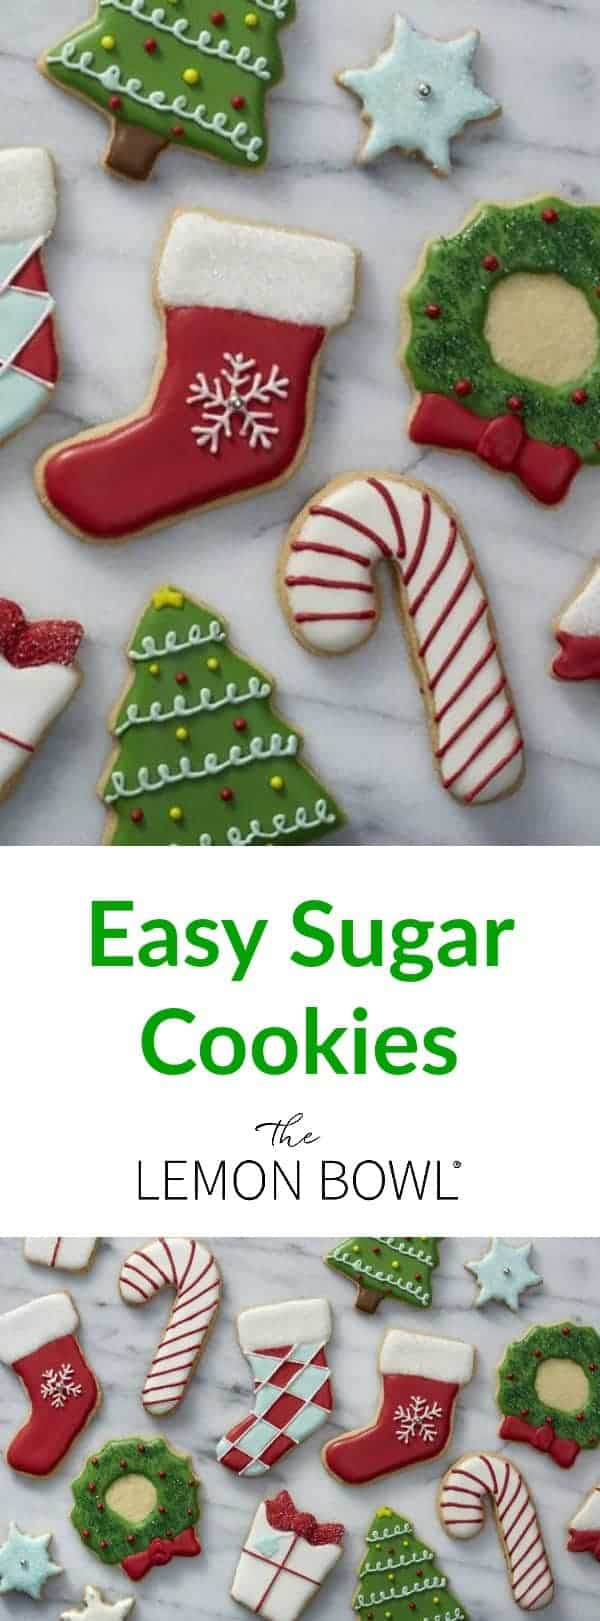 Easy Sugar Cookies The Lemon Bowl